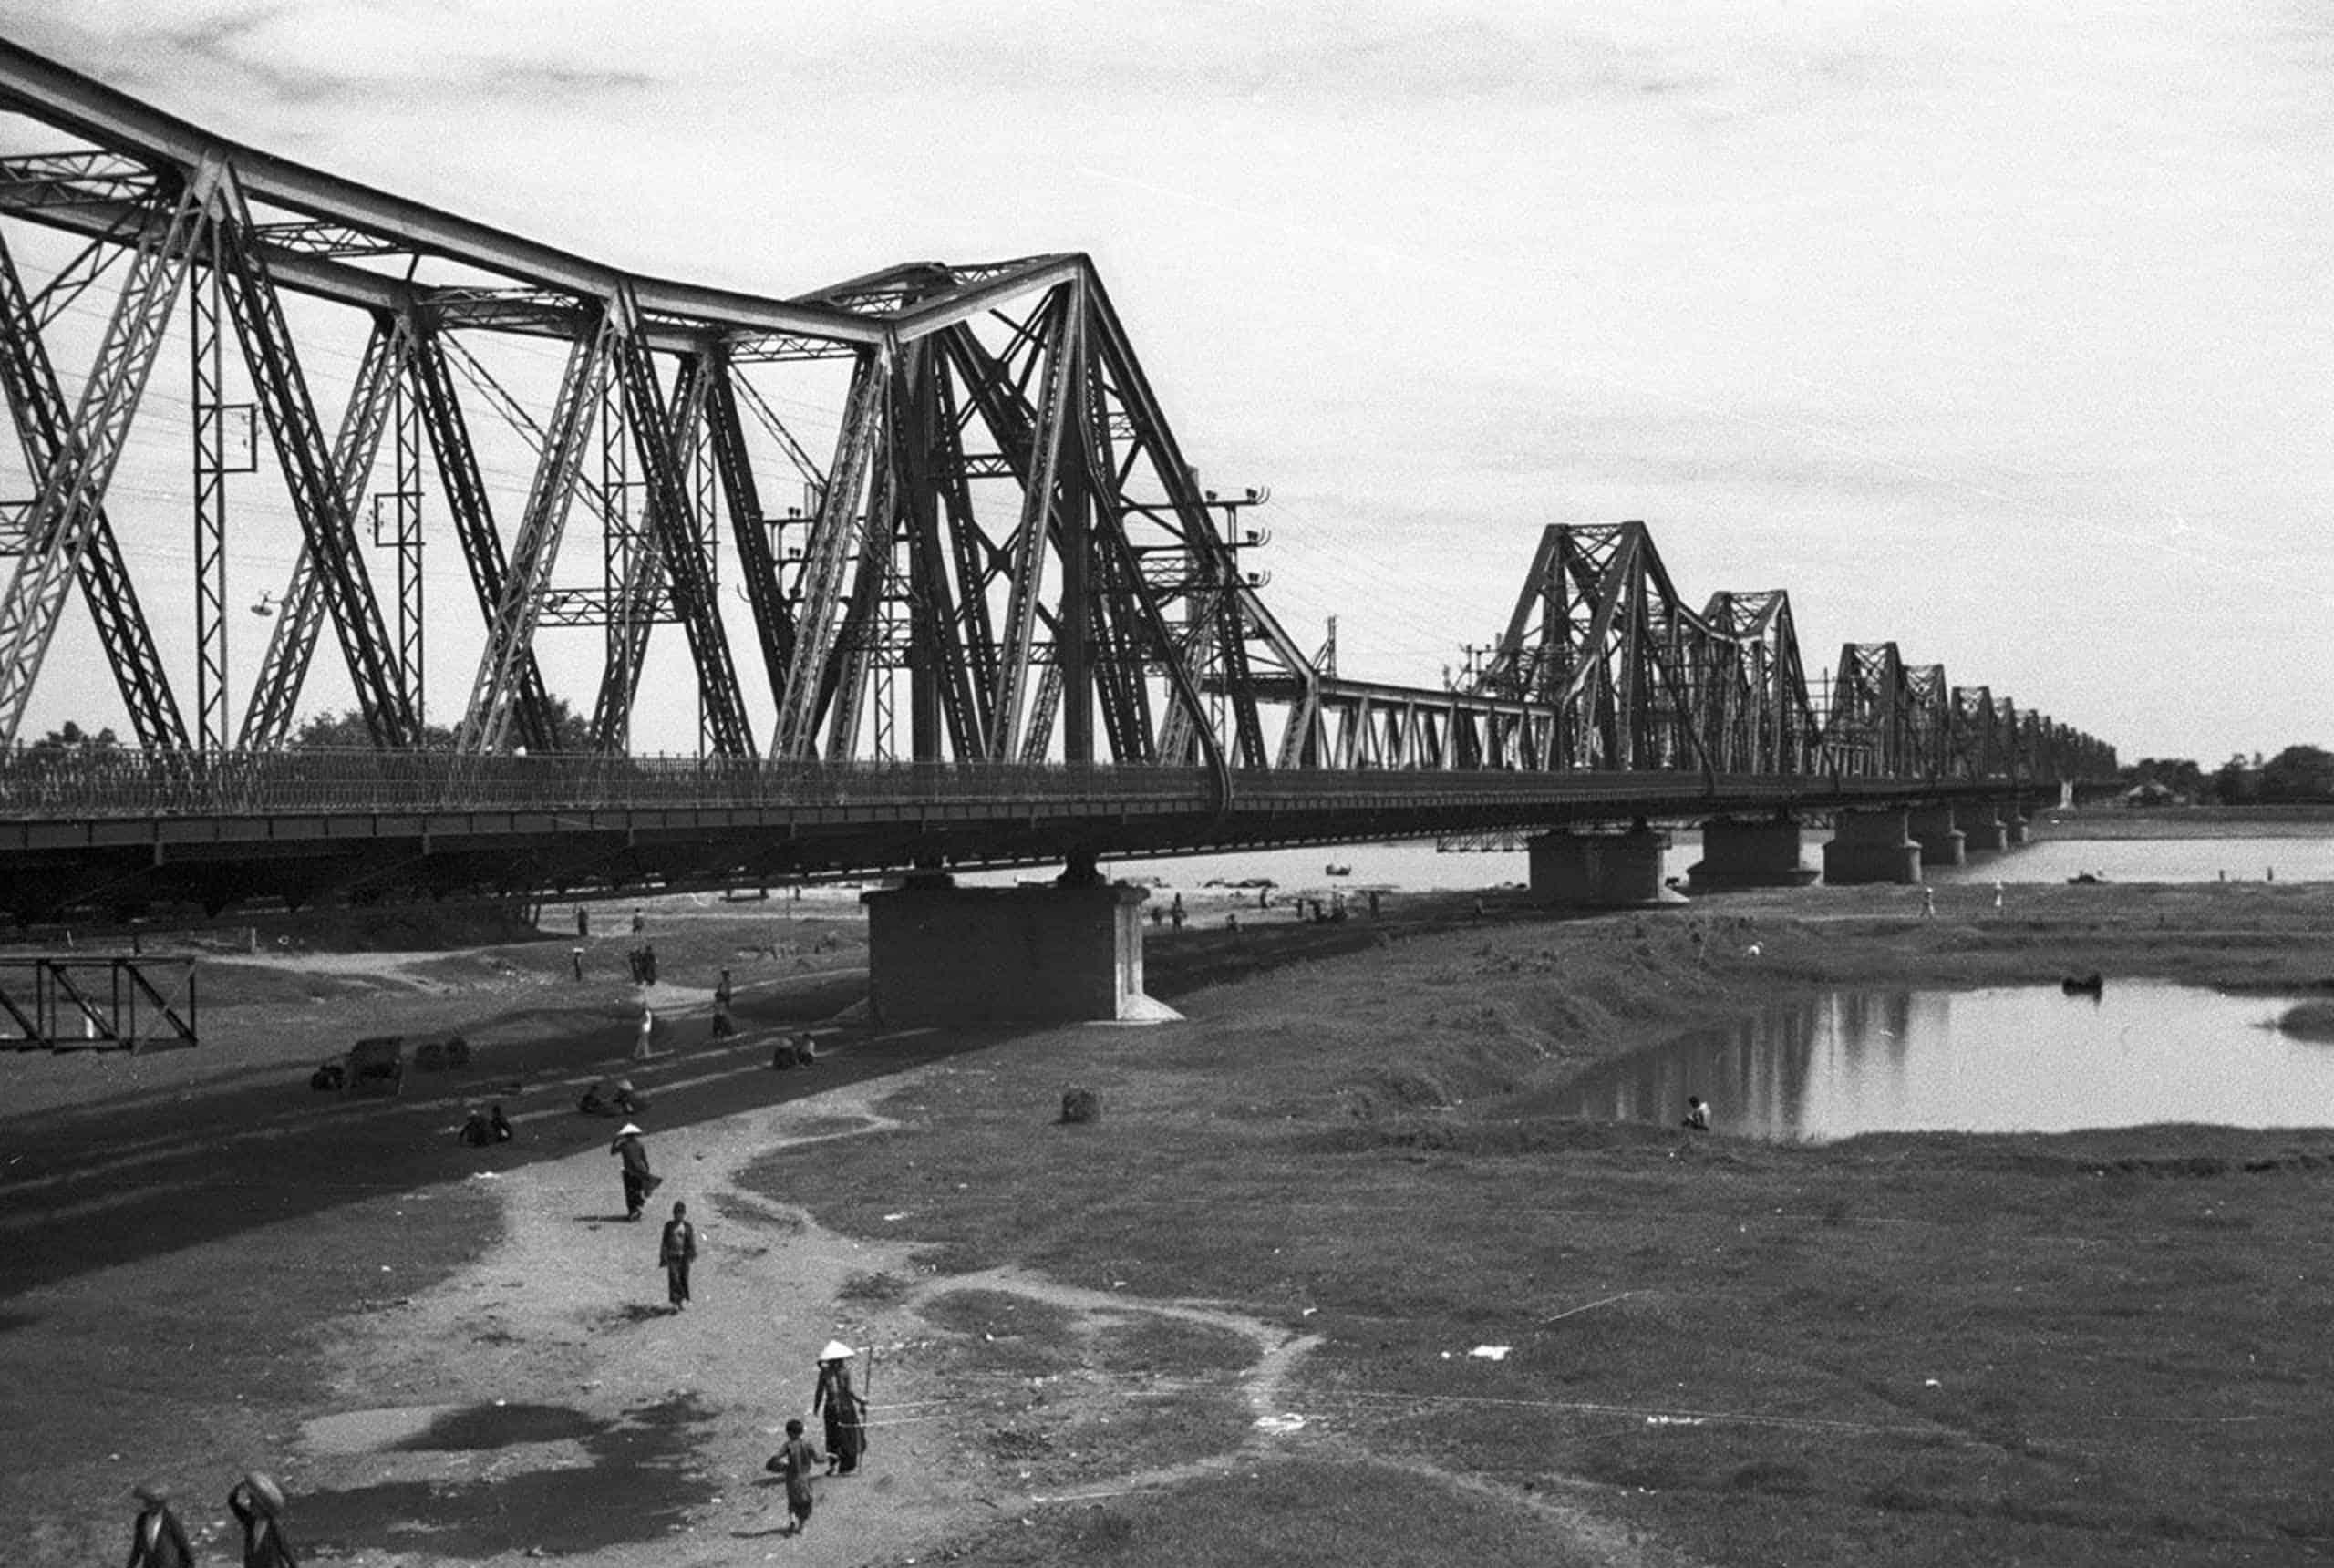 Long Bien Bridge in the 1940s